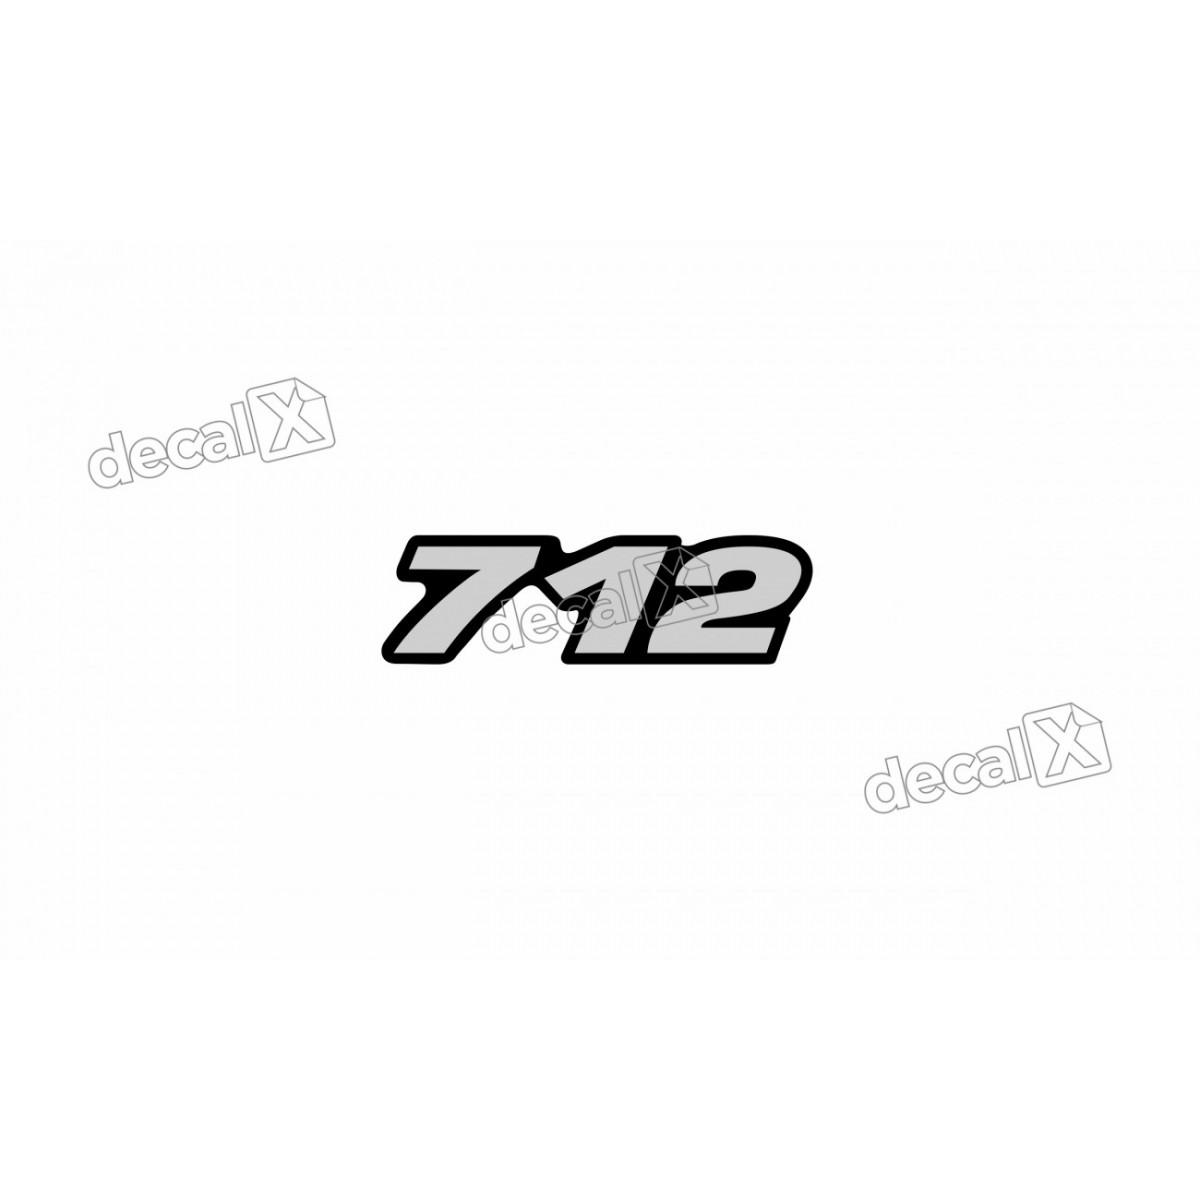 Adesivo Emblema Resinado Mercedes 712 Cm9 Decalx